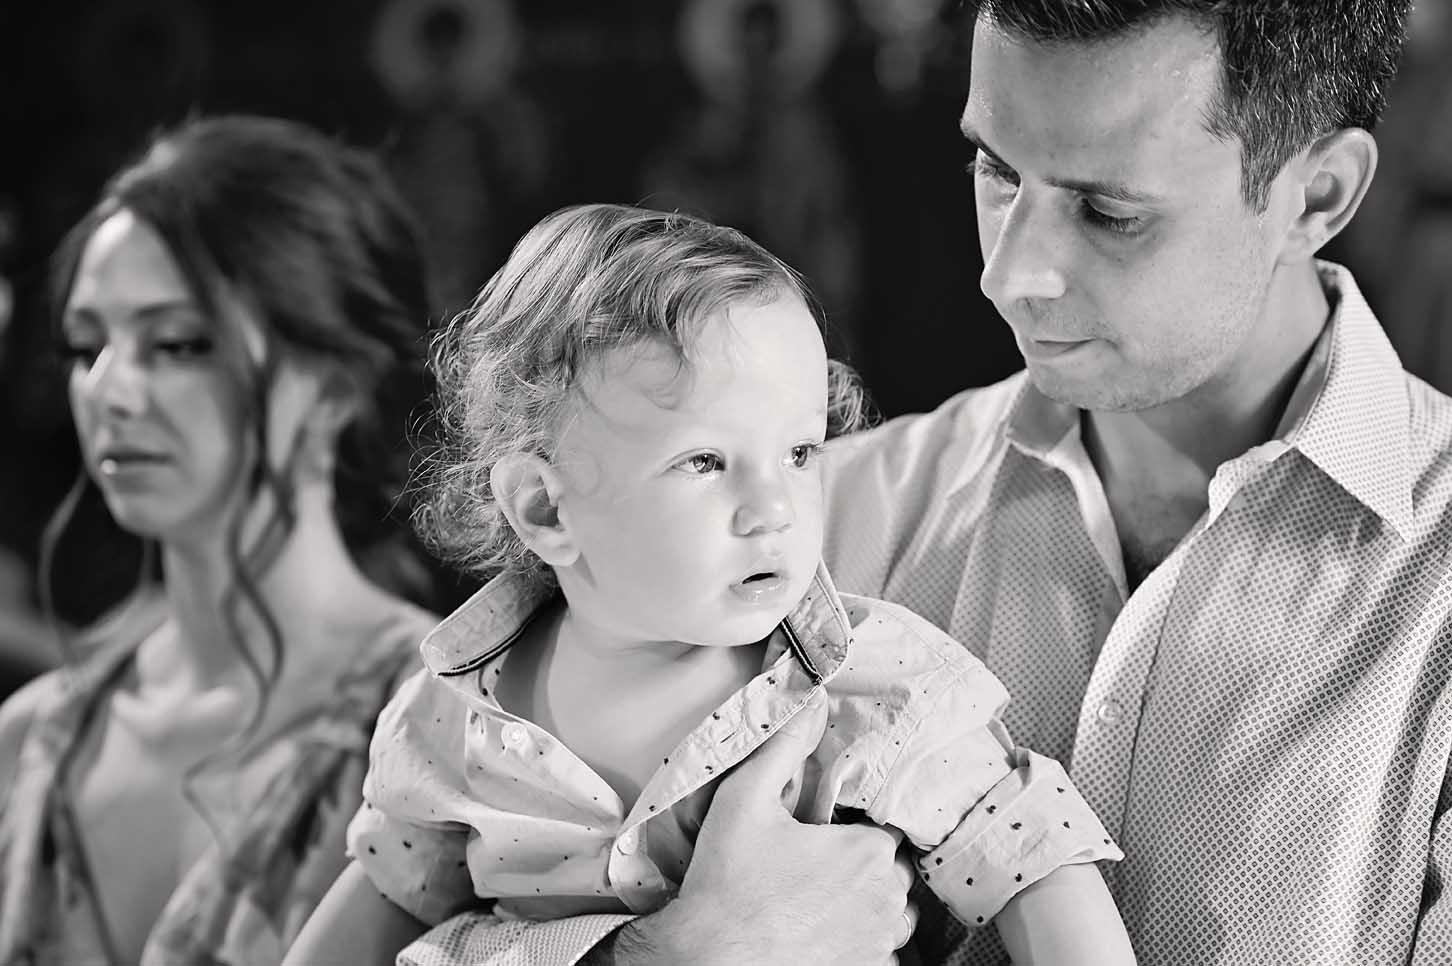 baptism-bw-christening – family -potrtait-alexis-koumaditis-larissa